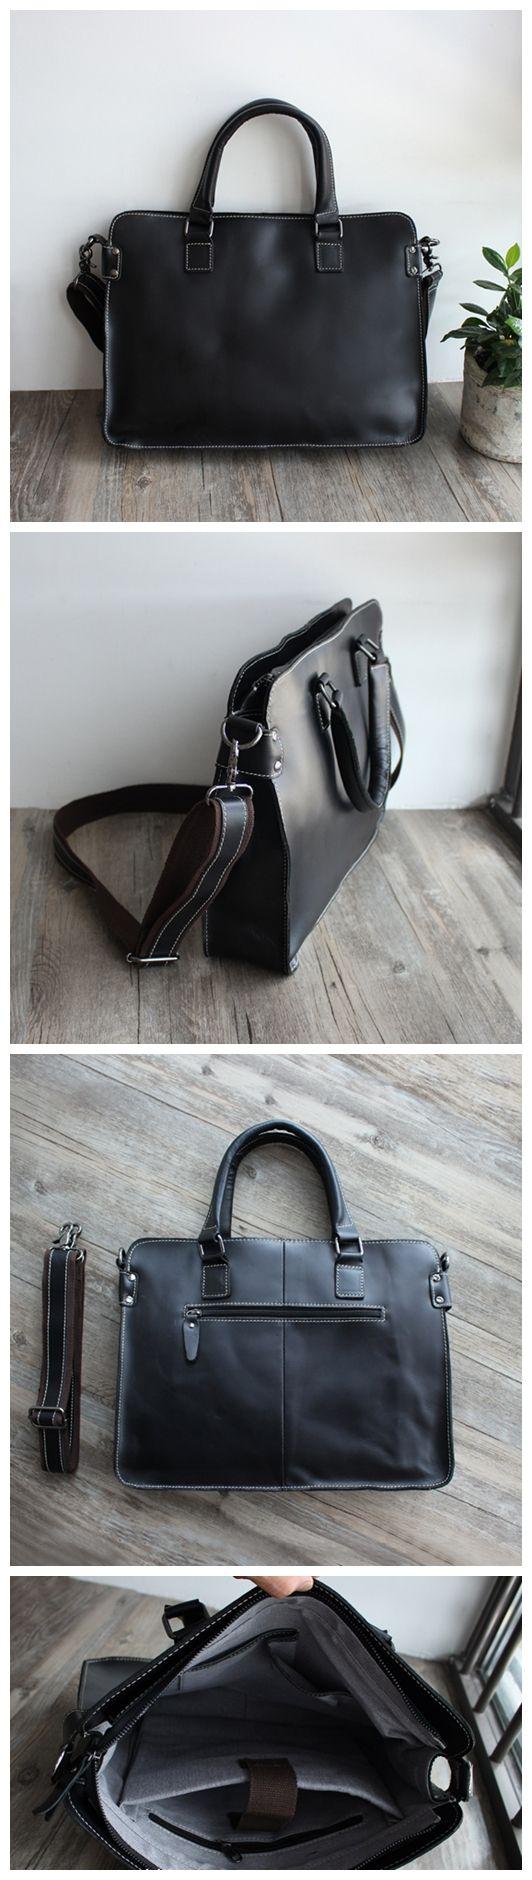 Black Top Grain Leather Briefcase for Men, Leather Laptop Bag GM011